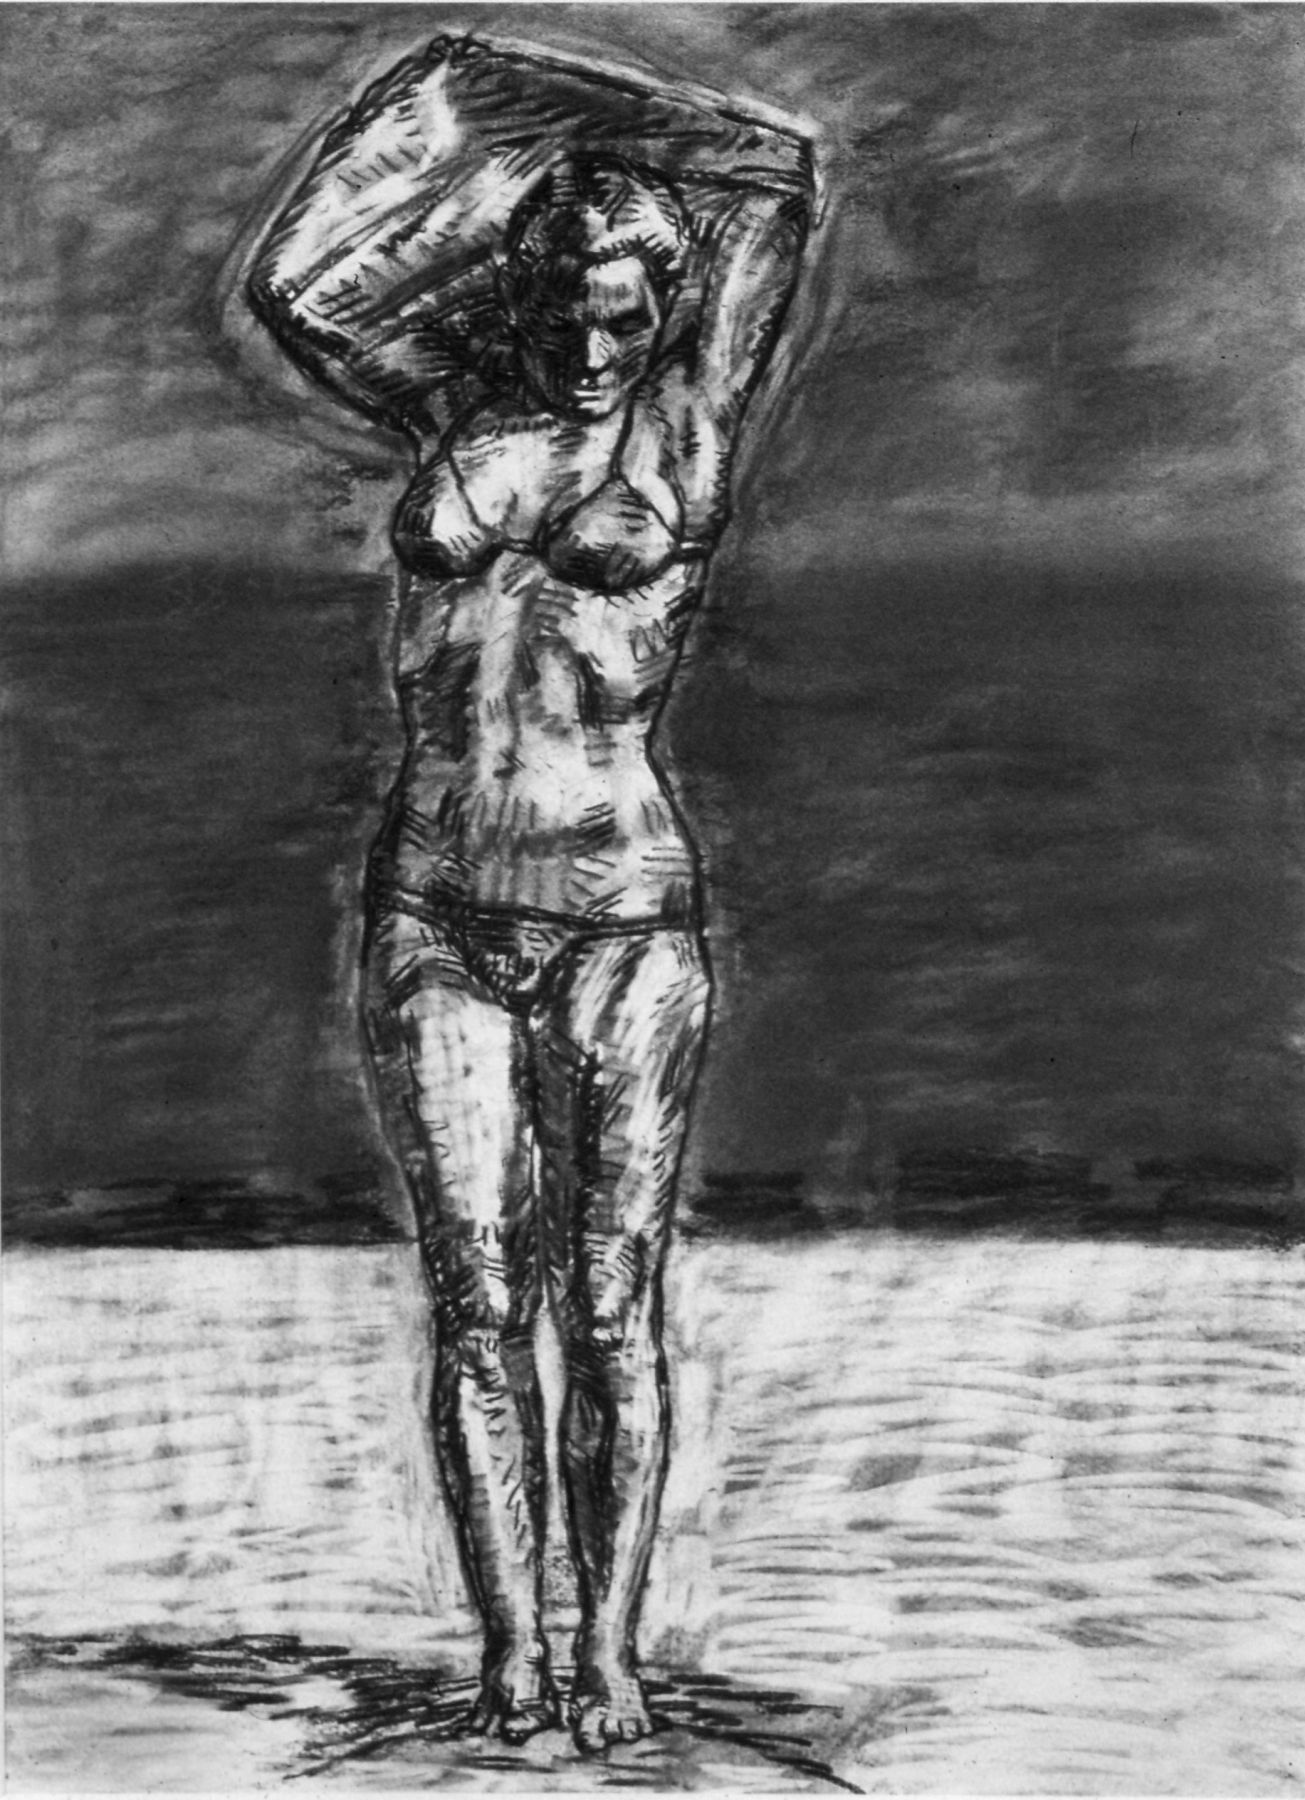 Graham Nickson  Study for Chevron: Orange Sail, 1984  Charcoal on paper  30 x 22 inches (76.2 x 55.9 cm)